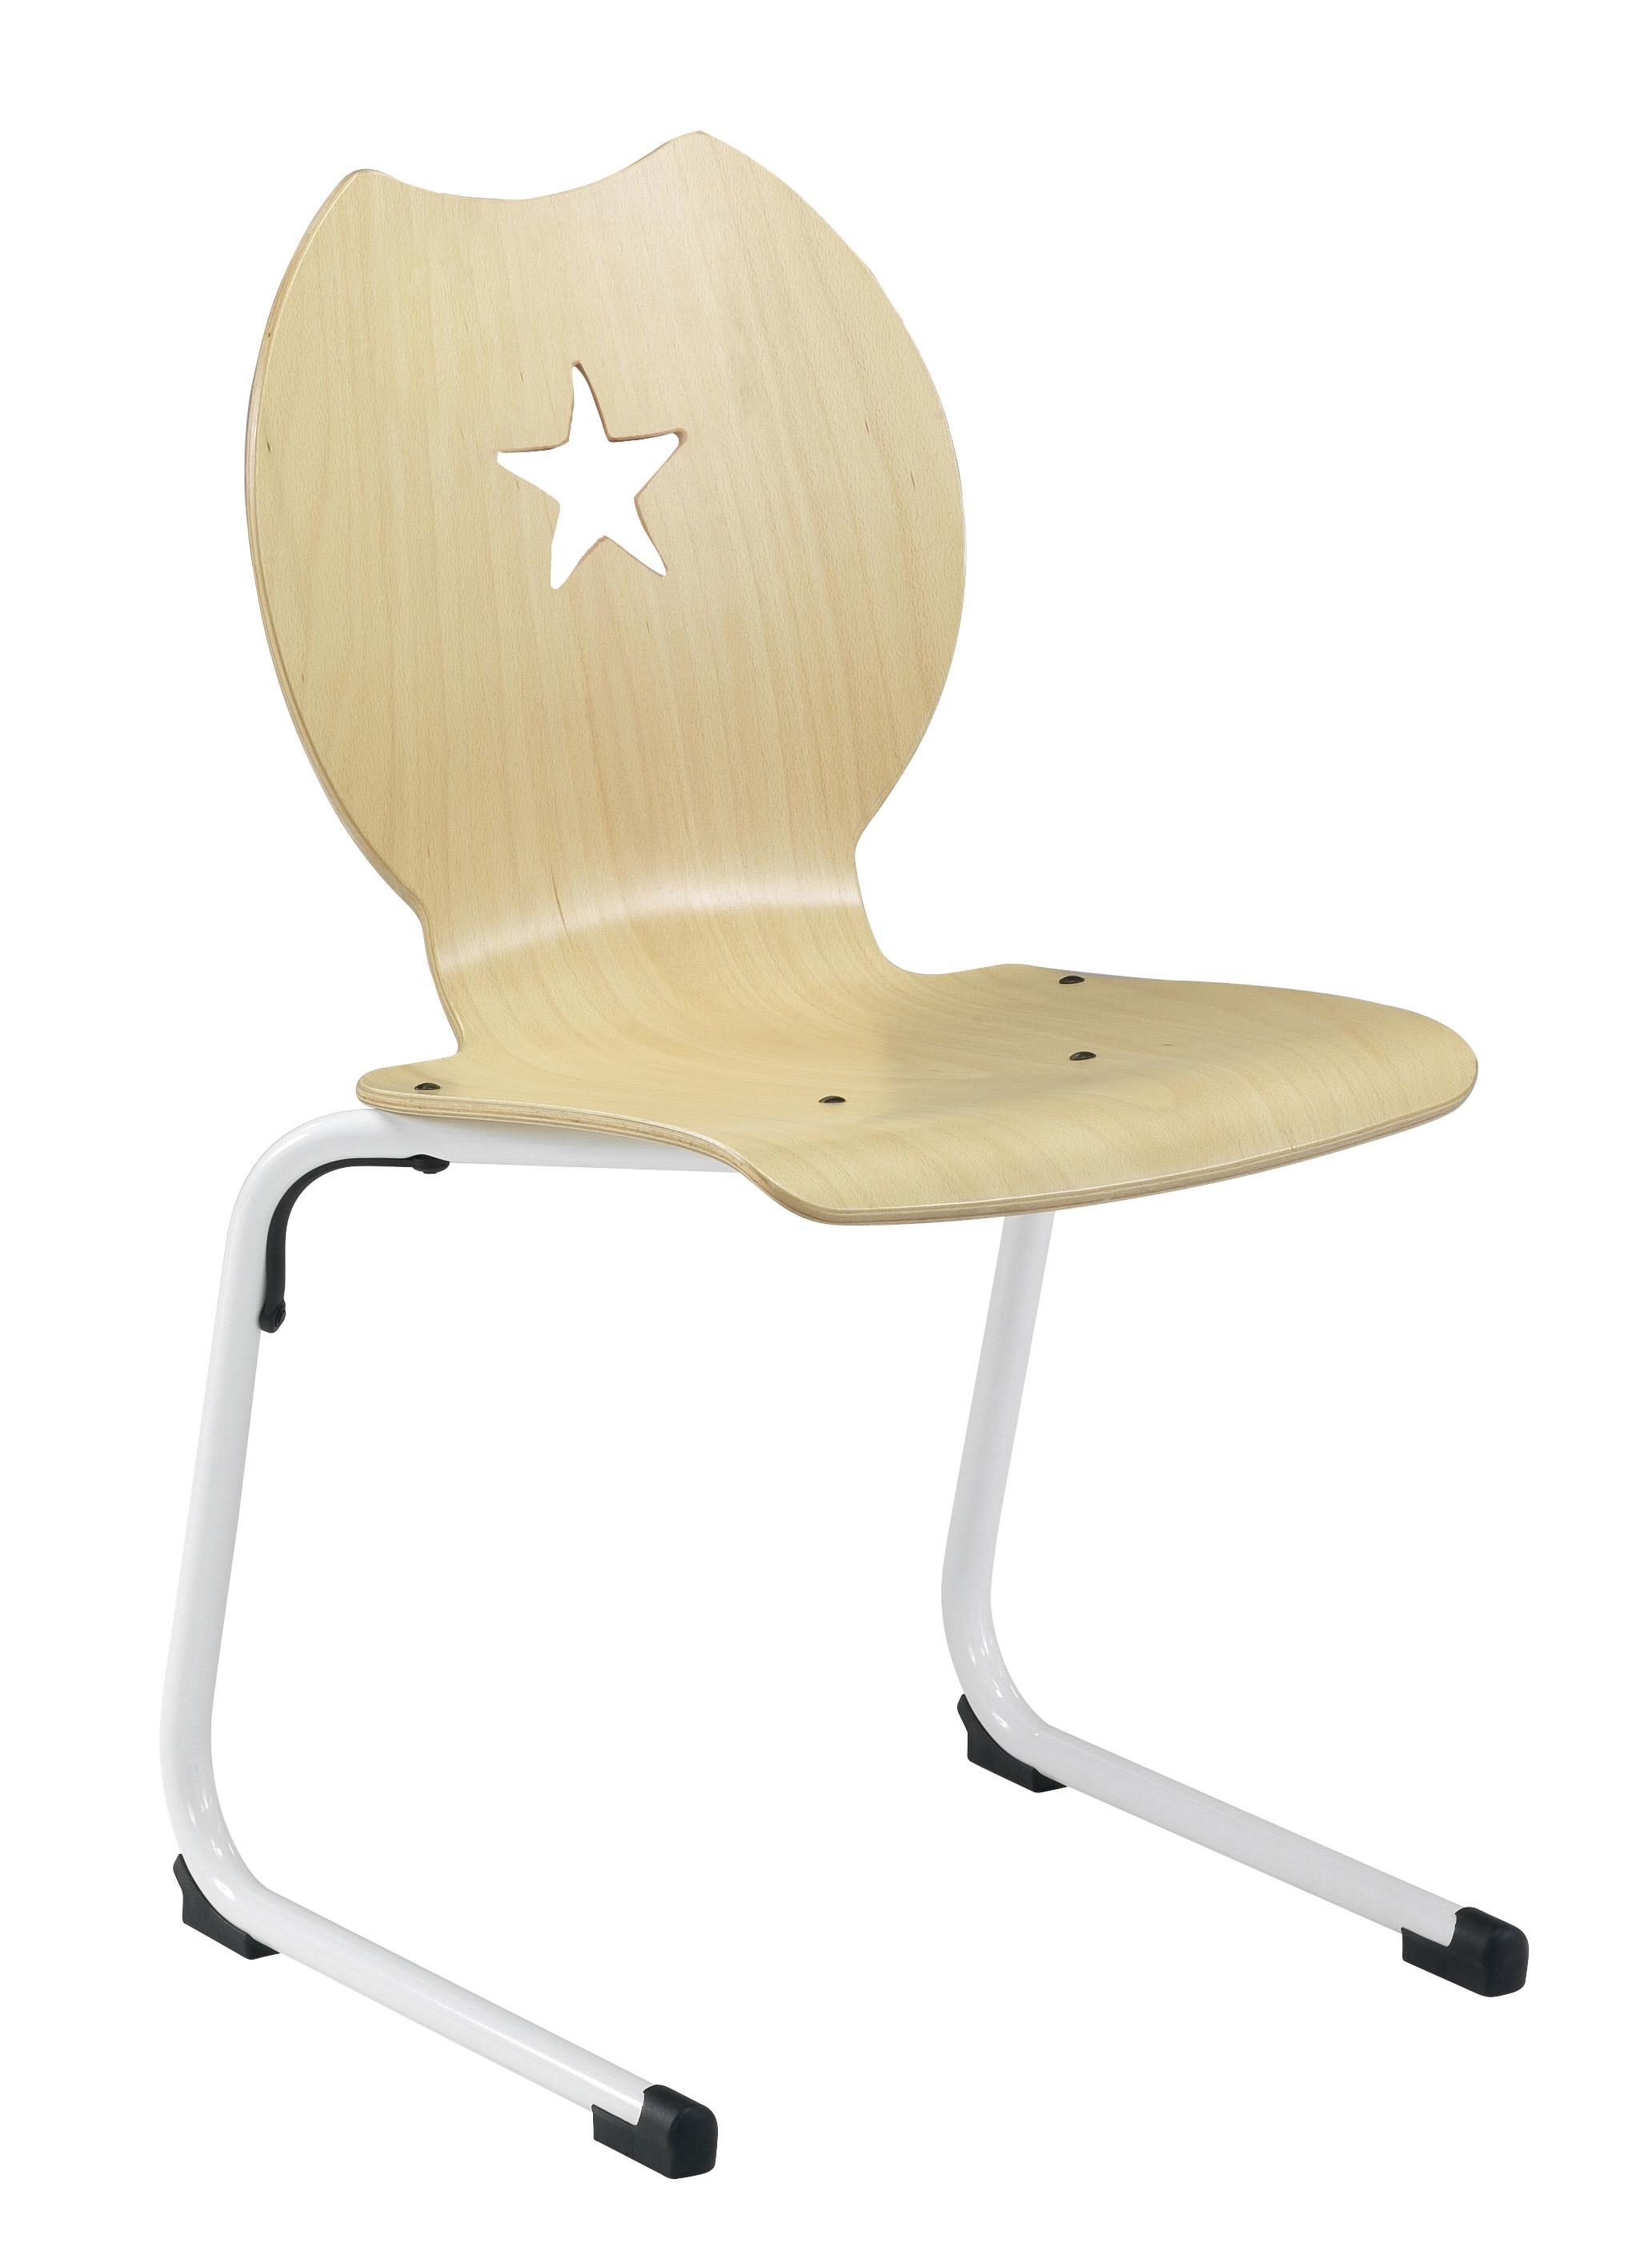 chaise coque bois ast nemo etoile simire. Black Bedroom Furniture Sets. Home Design Ideas